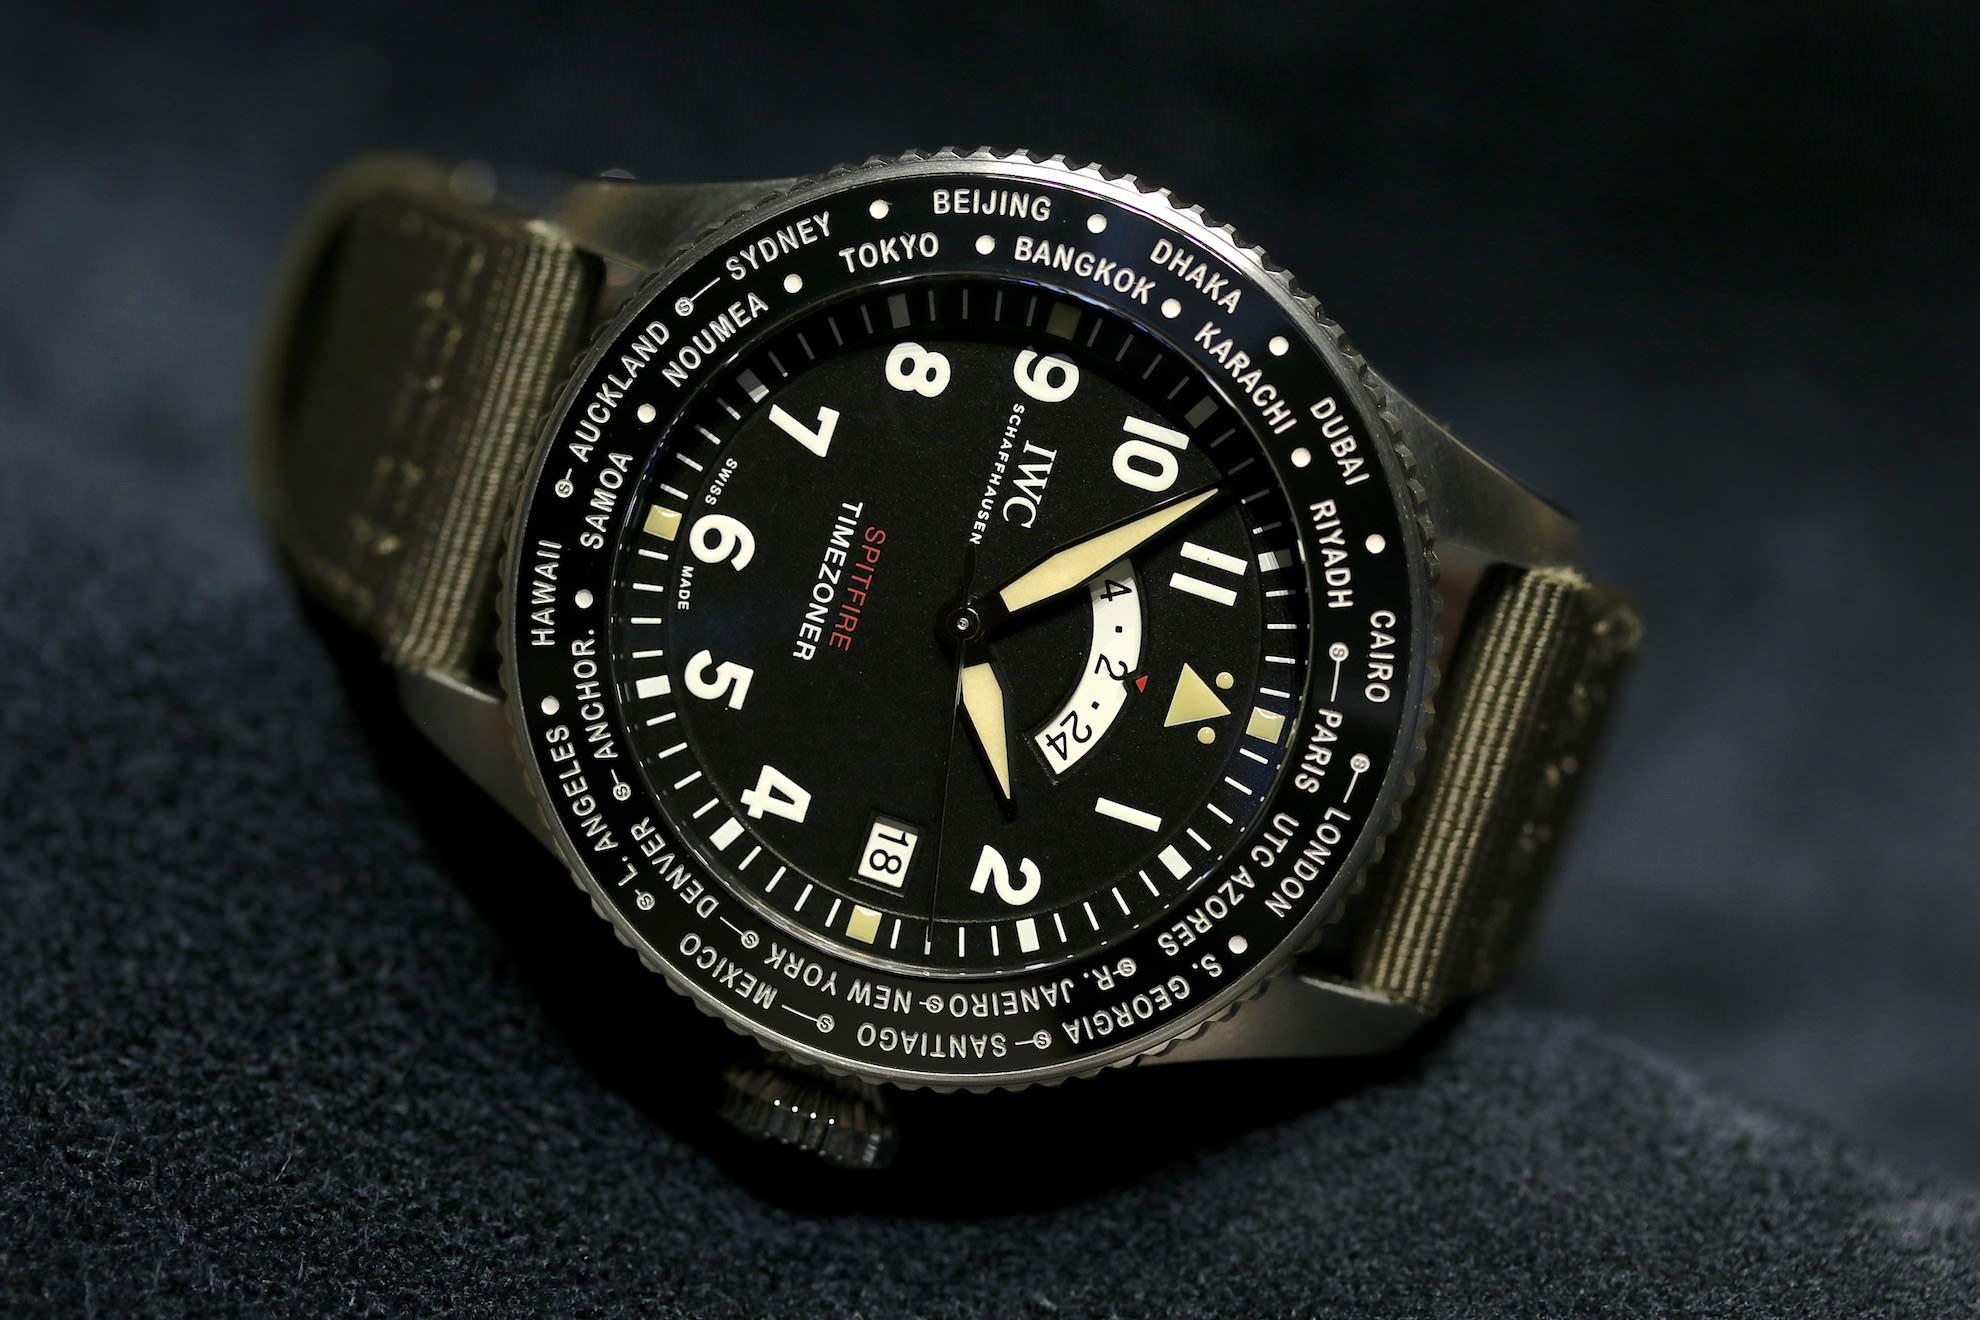 IWC_Pilots_Watch_Timezone_Spitfire_2